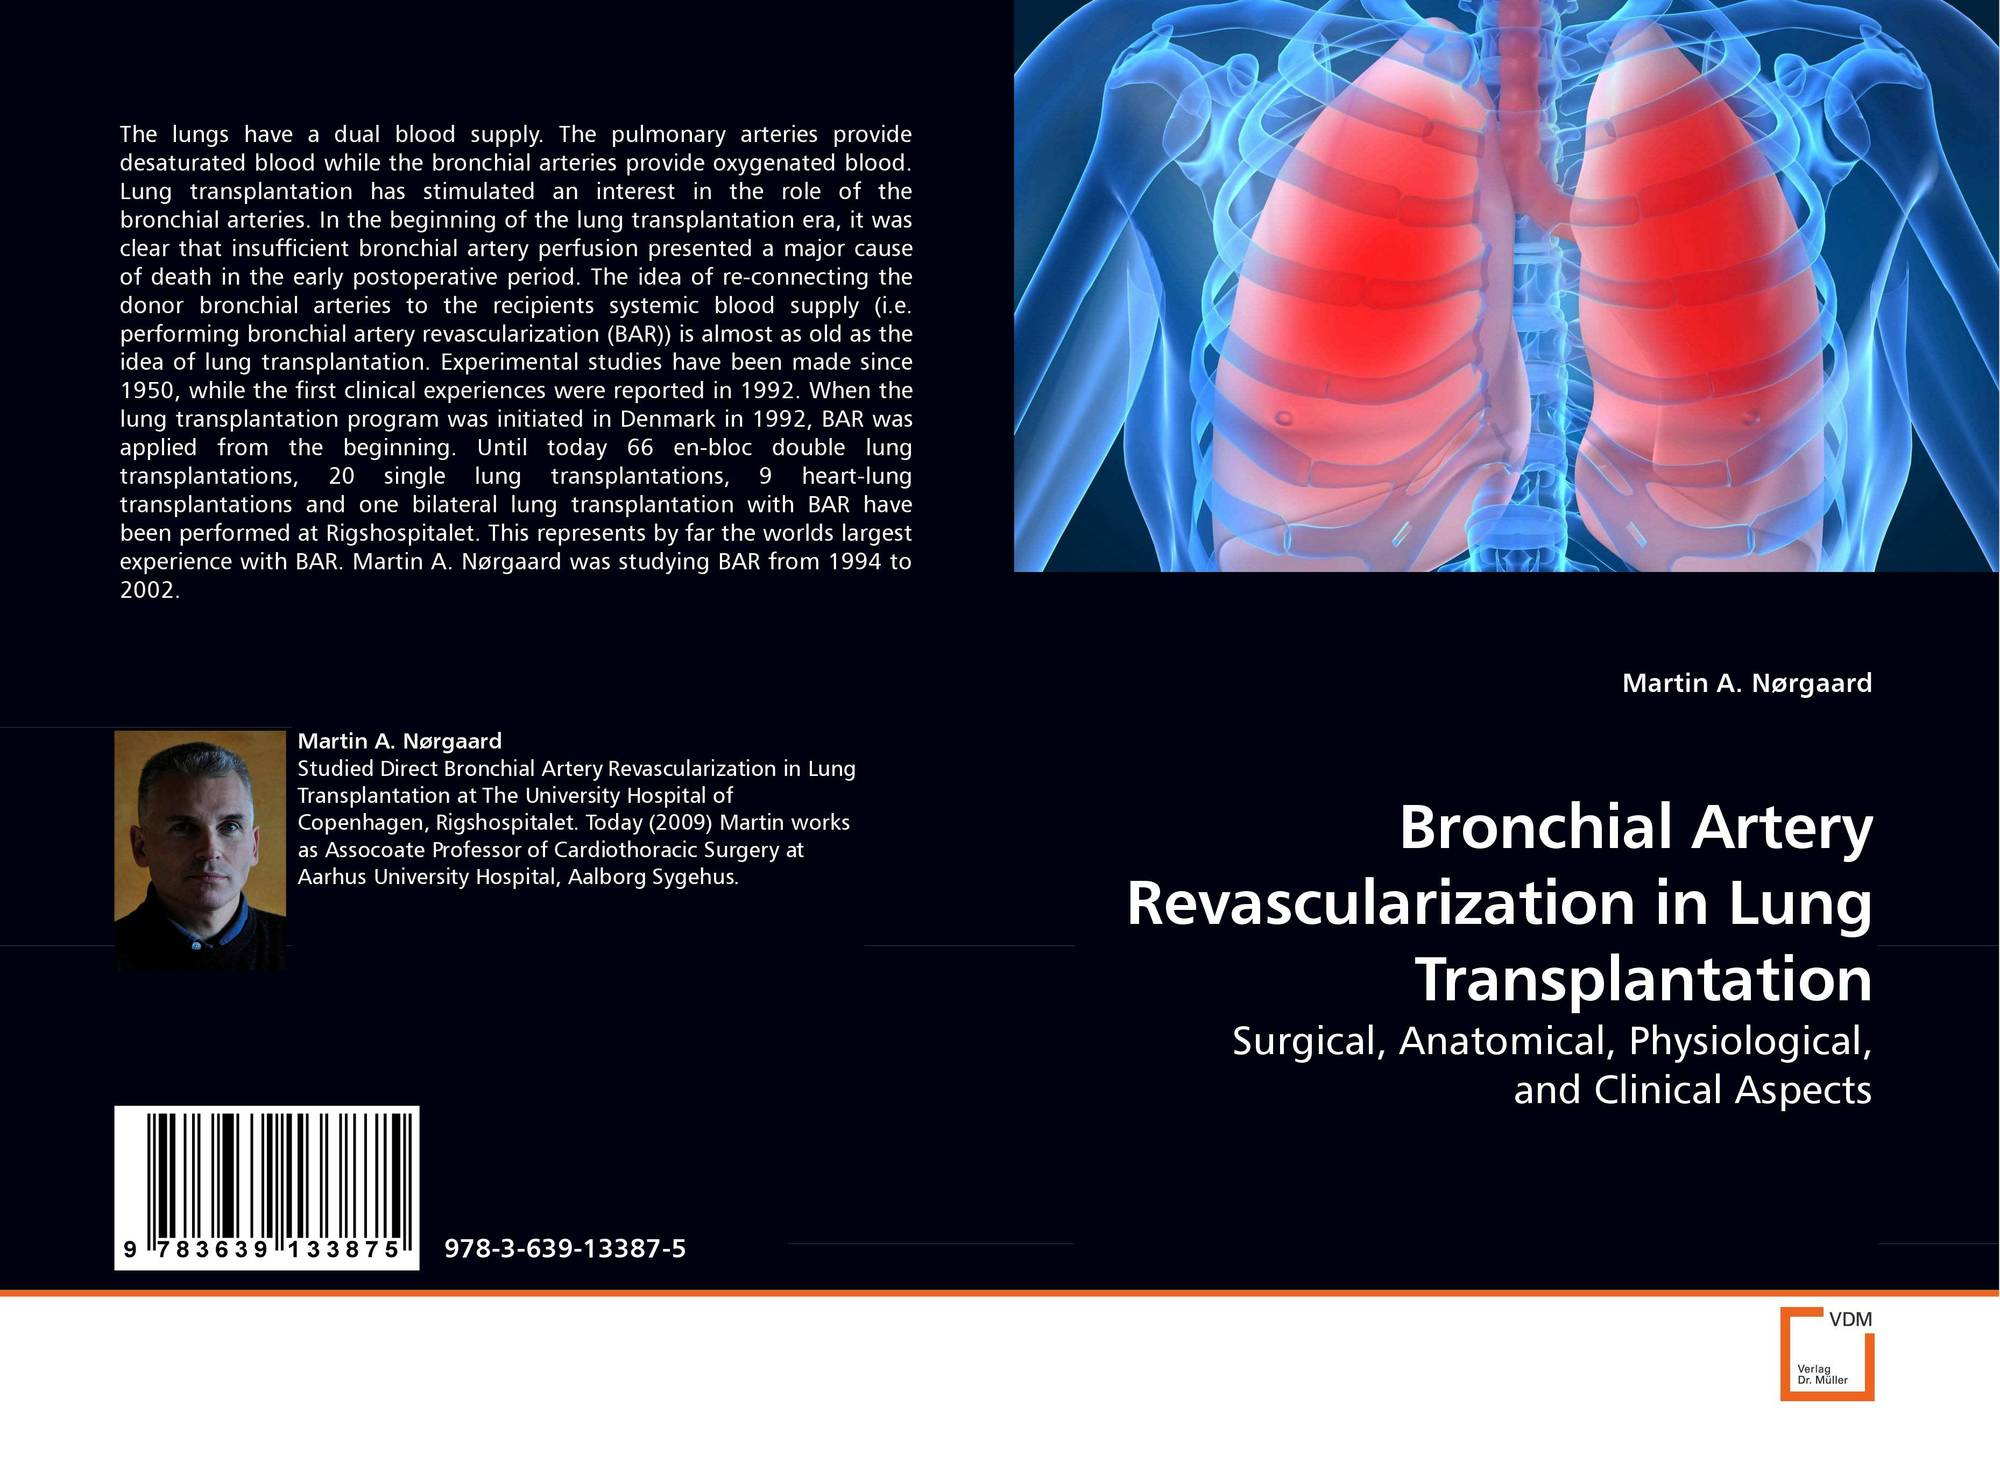 Bronchial Artery Revascularization In Lung Transplantation 978 3